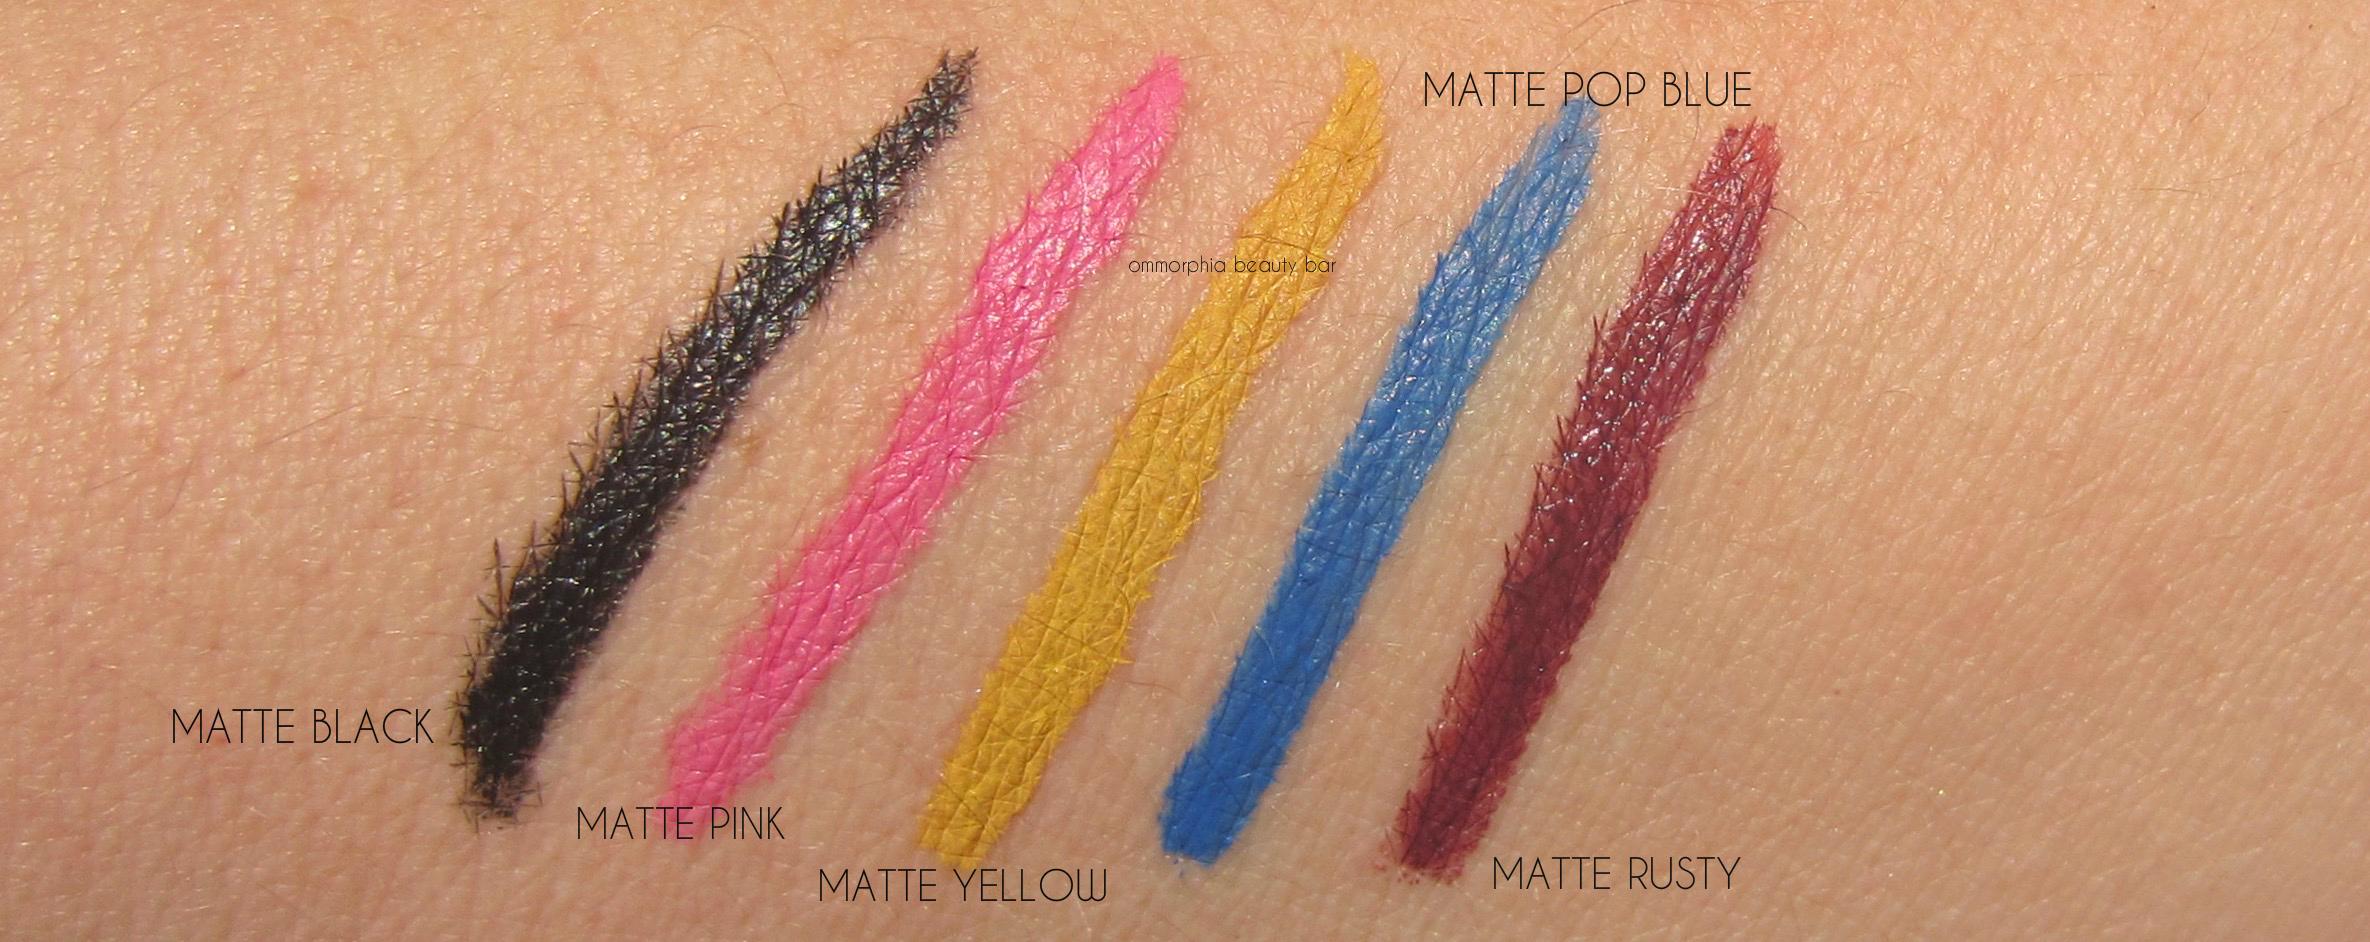 Addict Lipstick Hydra-Gel Core Mirror Shine by Dior #15